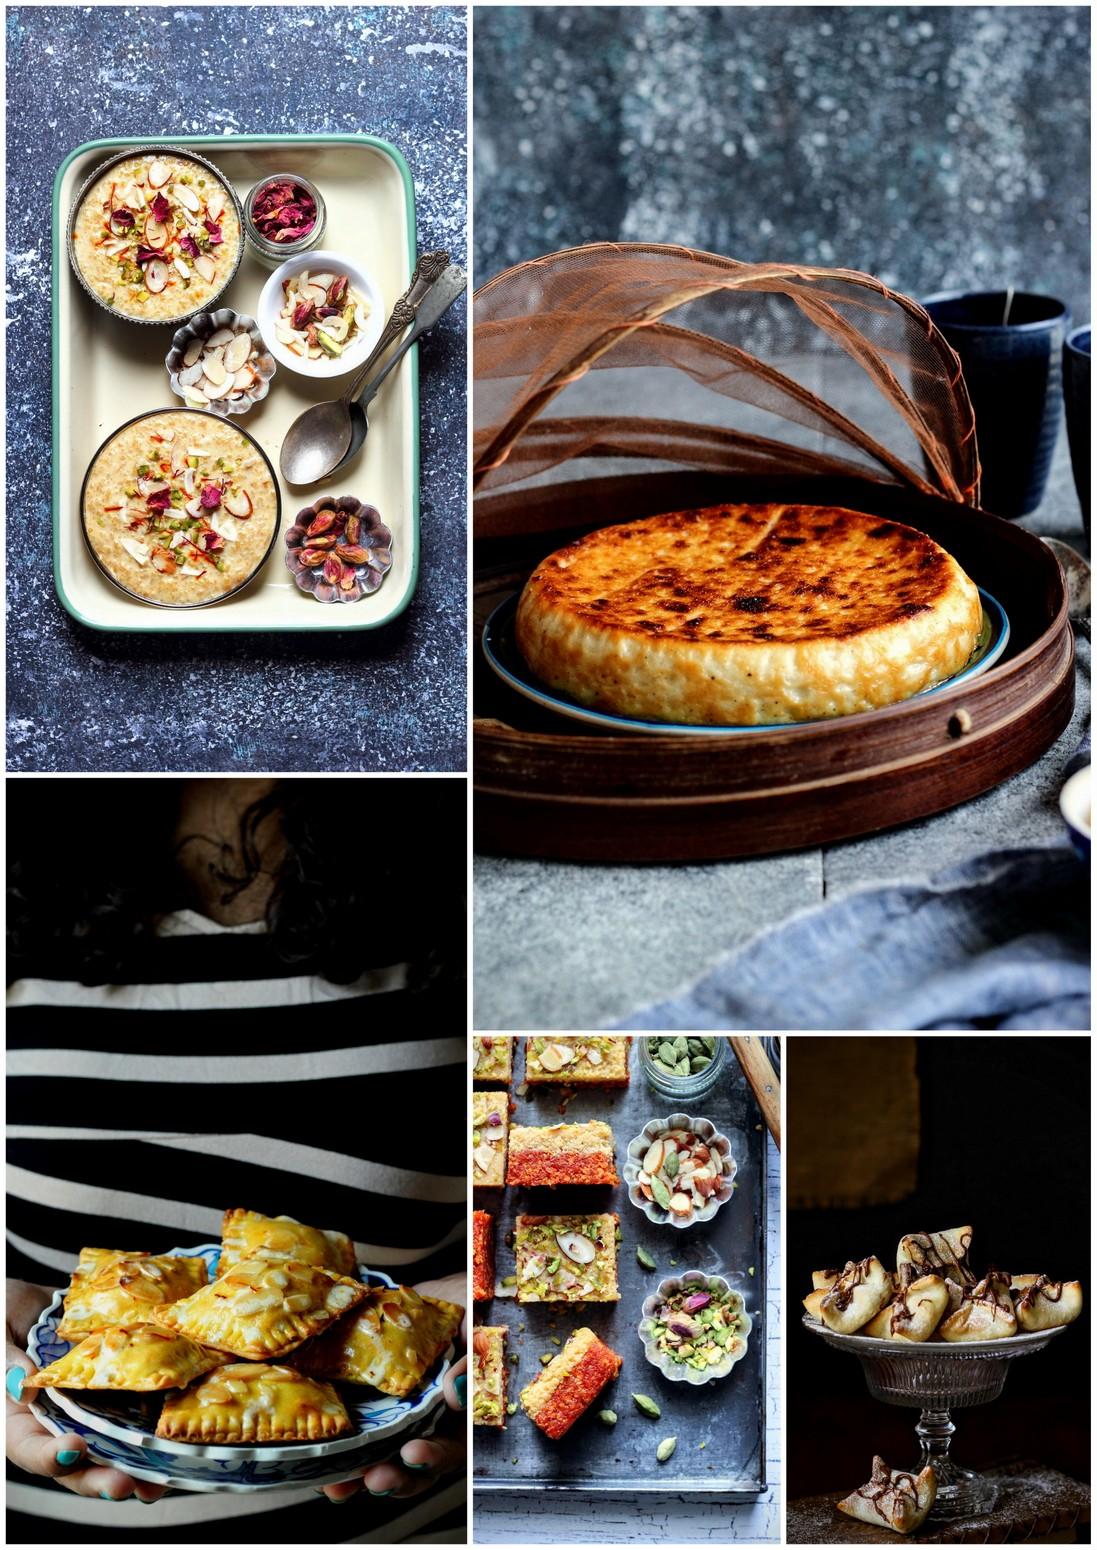 10. Make Ahead Indian Desserts